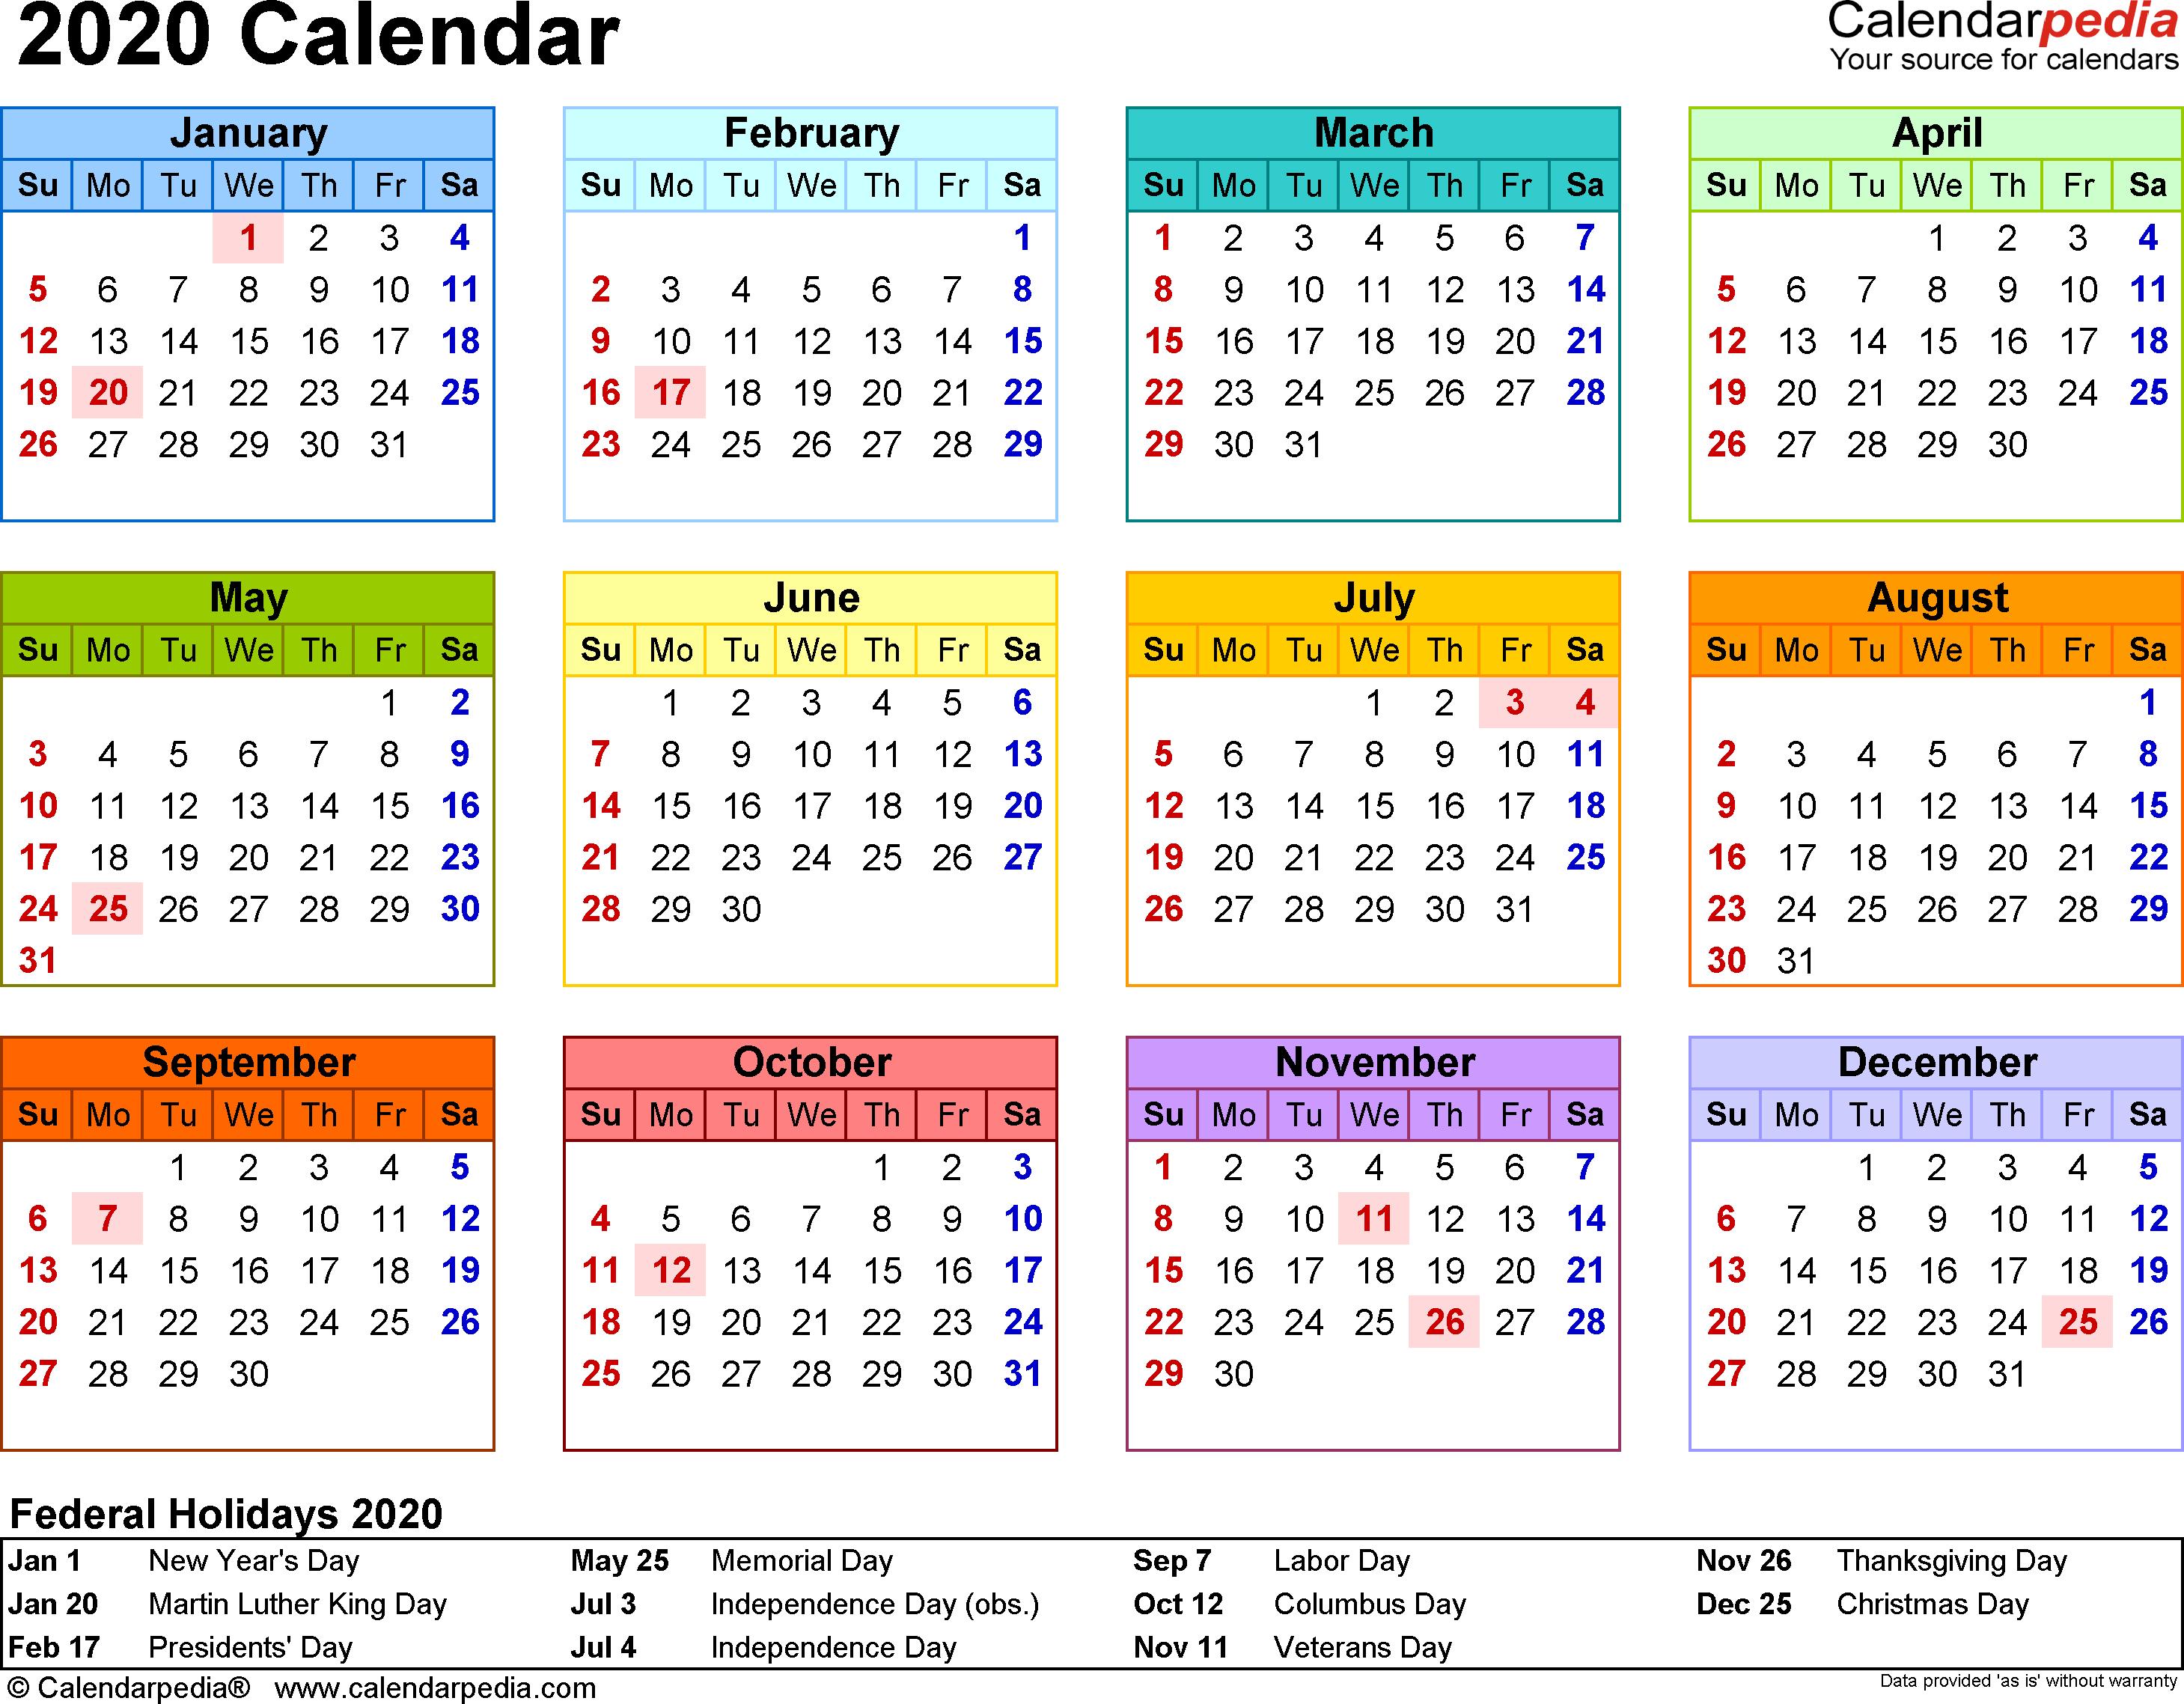 2020 Calendar - 17 Free Printable Word Calendar Templates